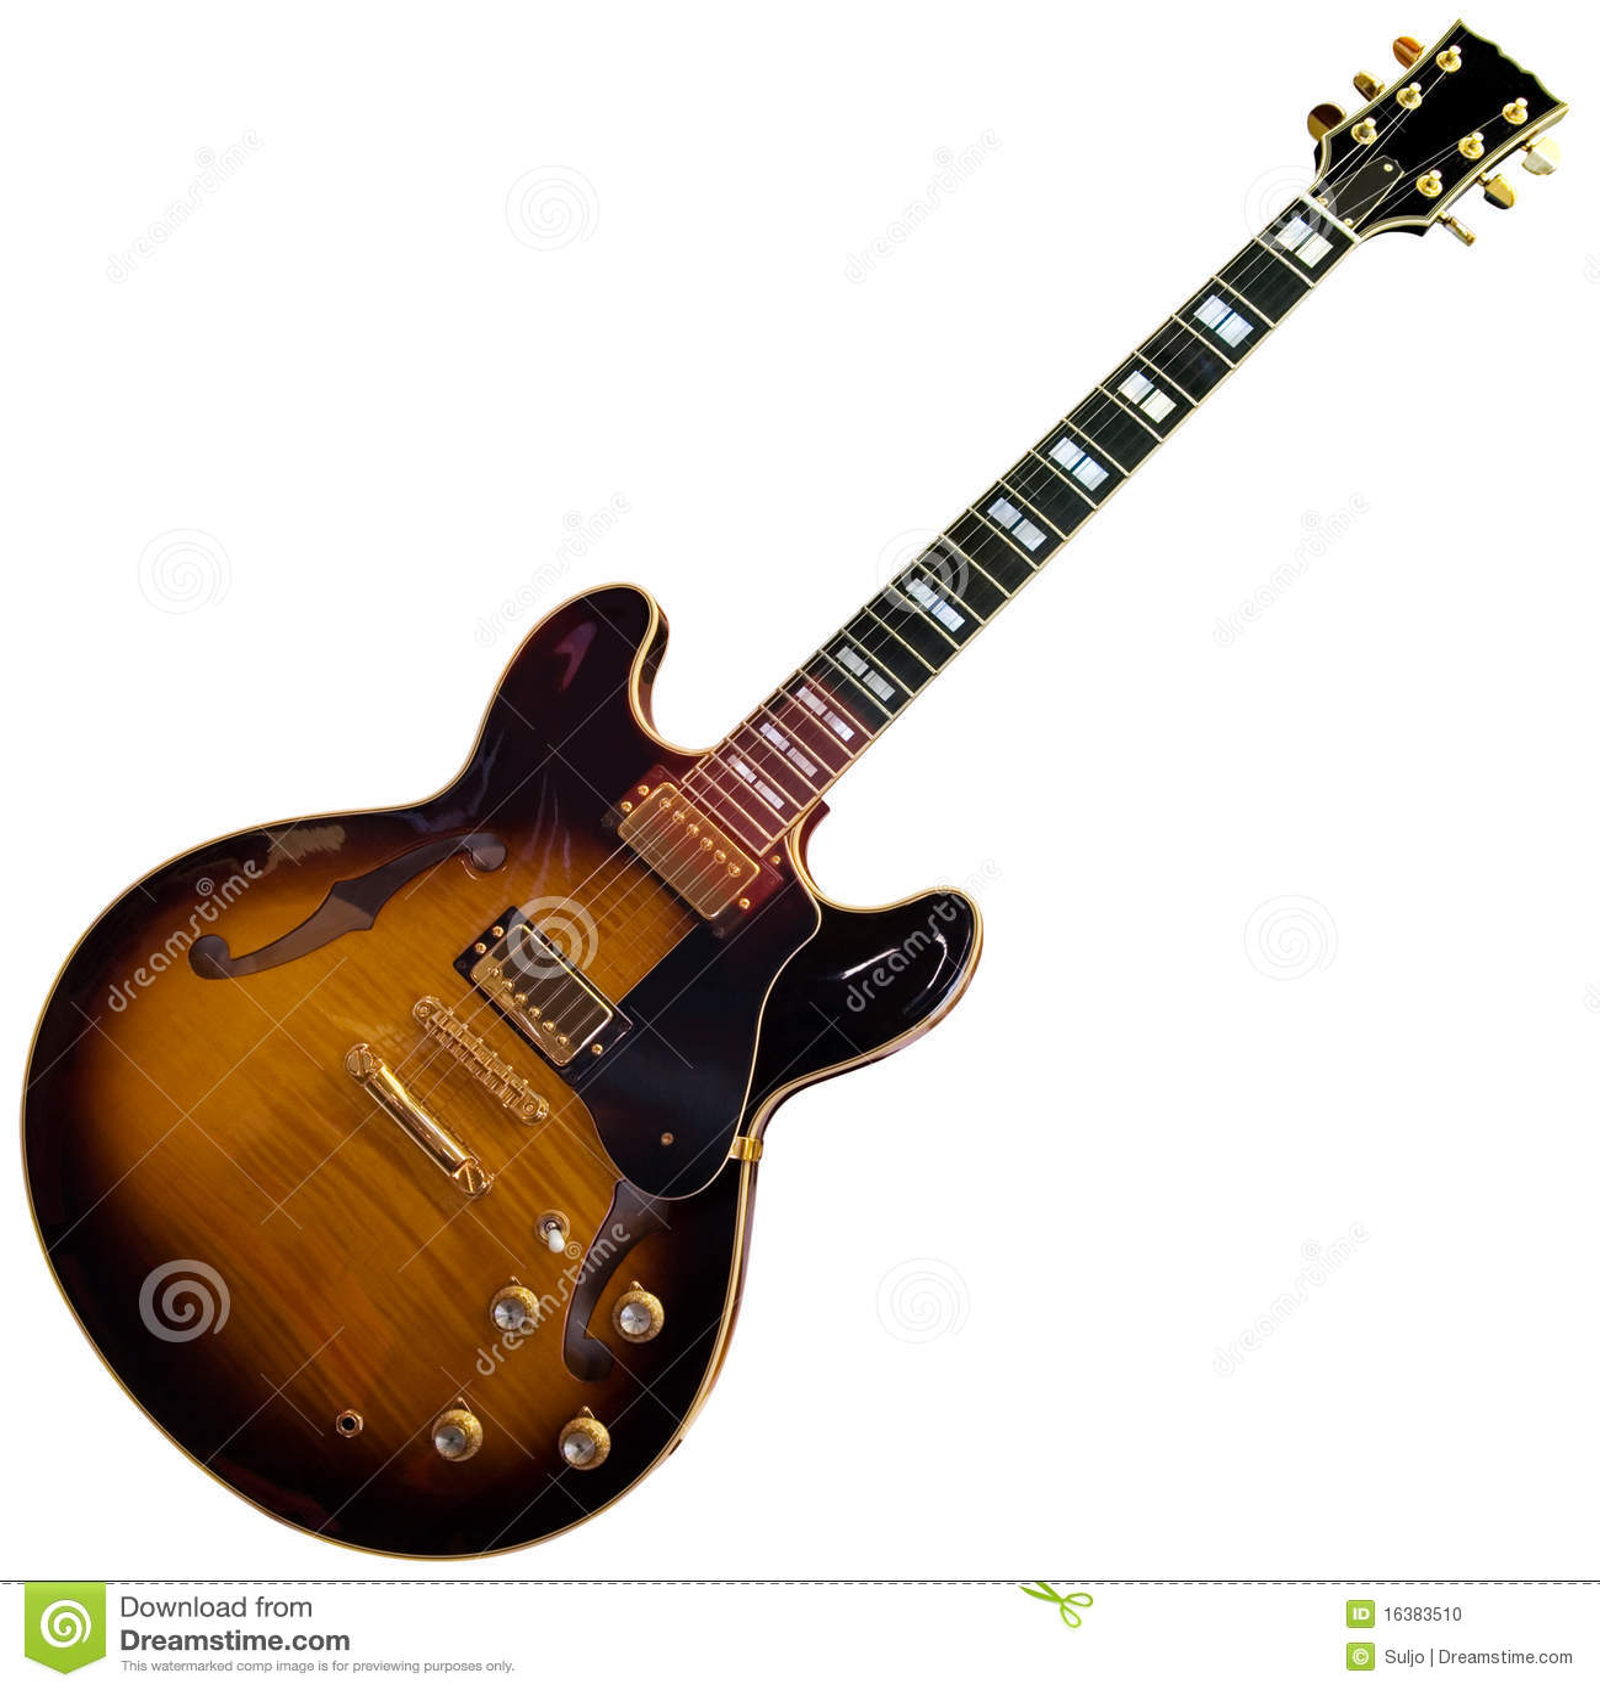 Electric guitar cutout